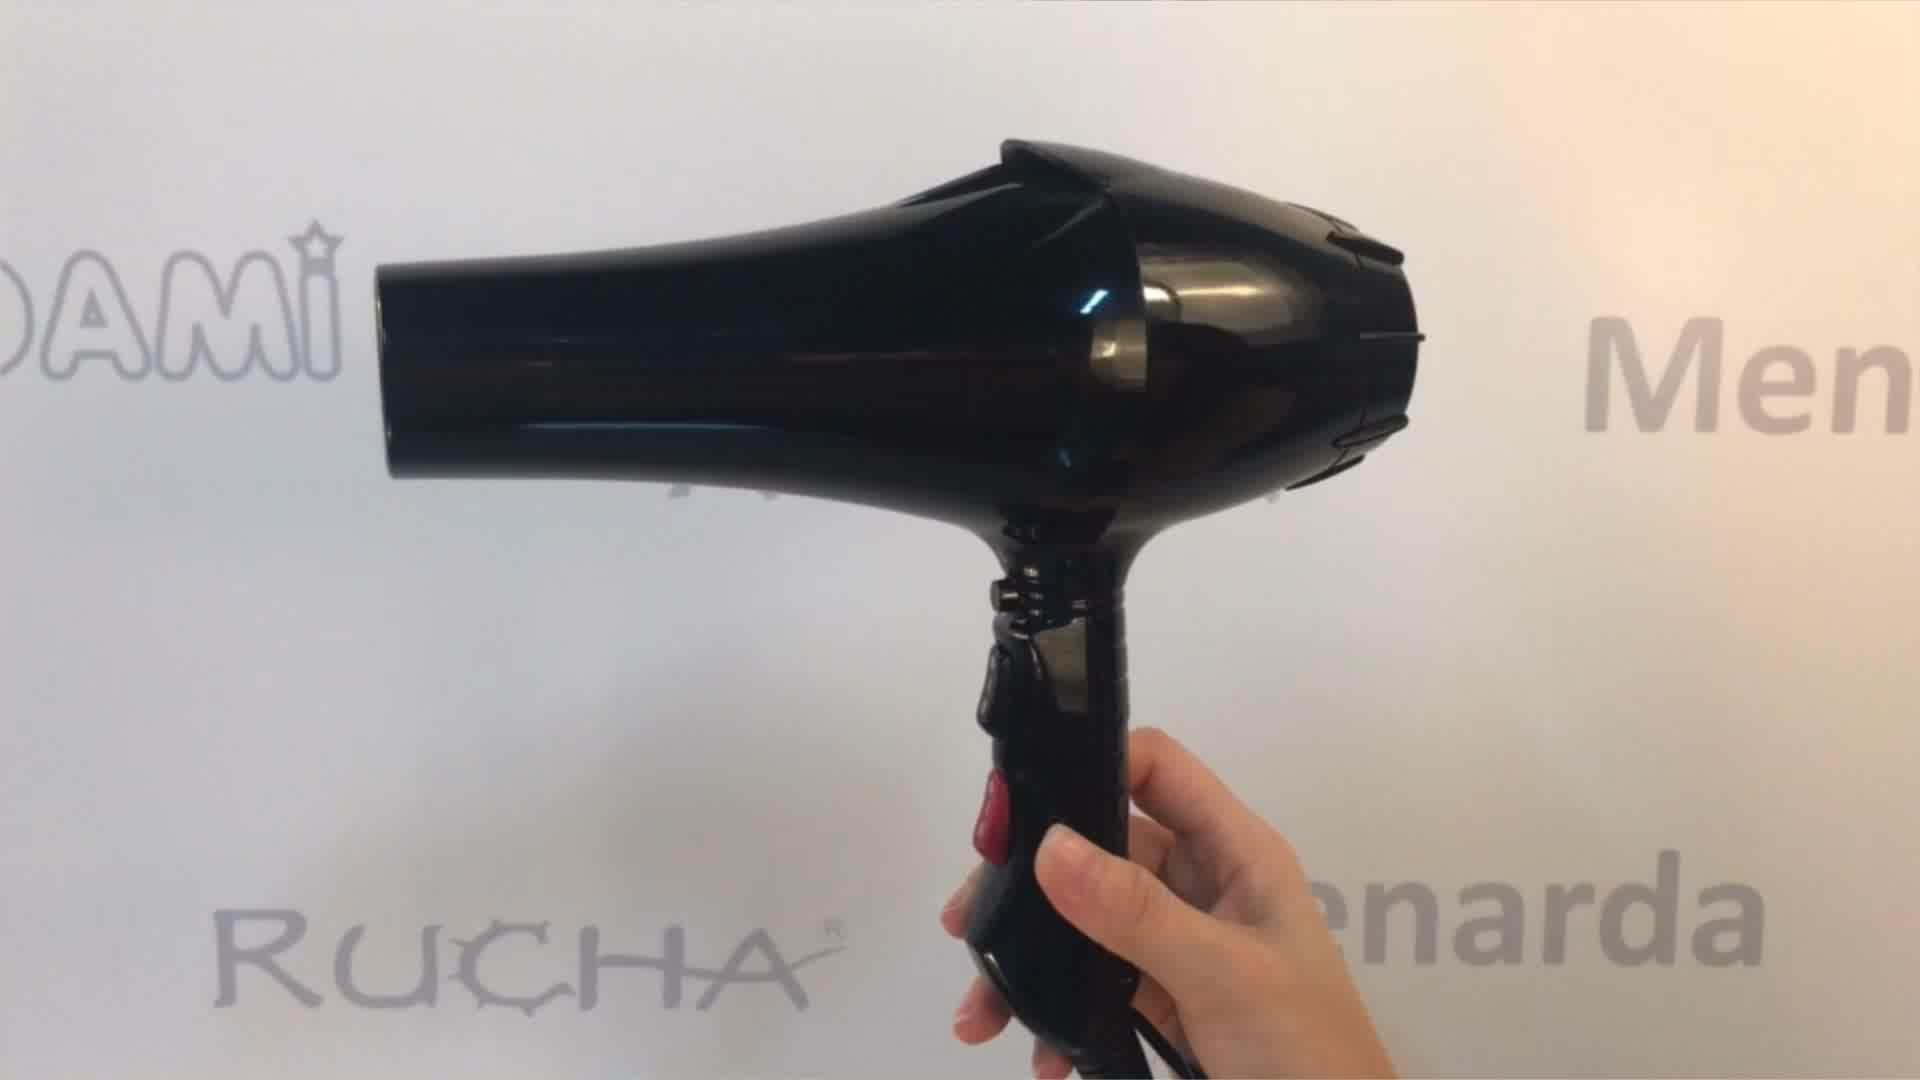 New popular Ultra-Power lightweight infrared ionic Professional hair dryer